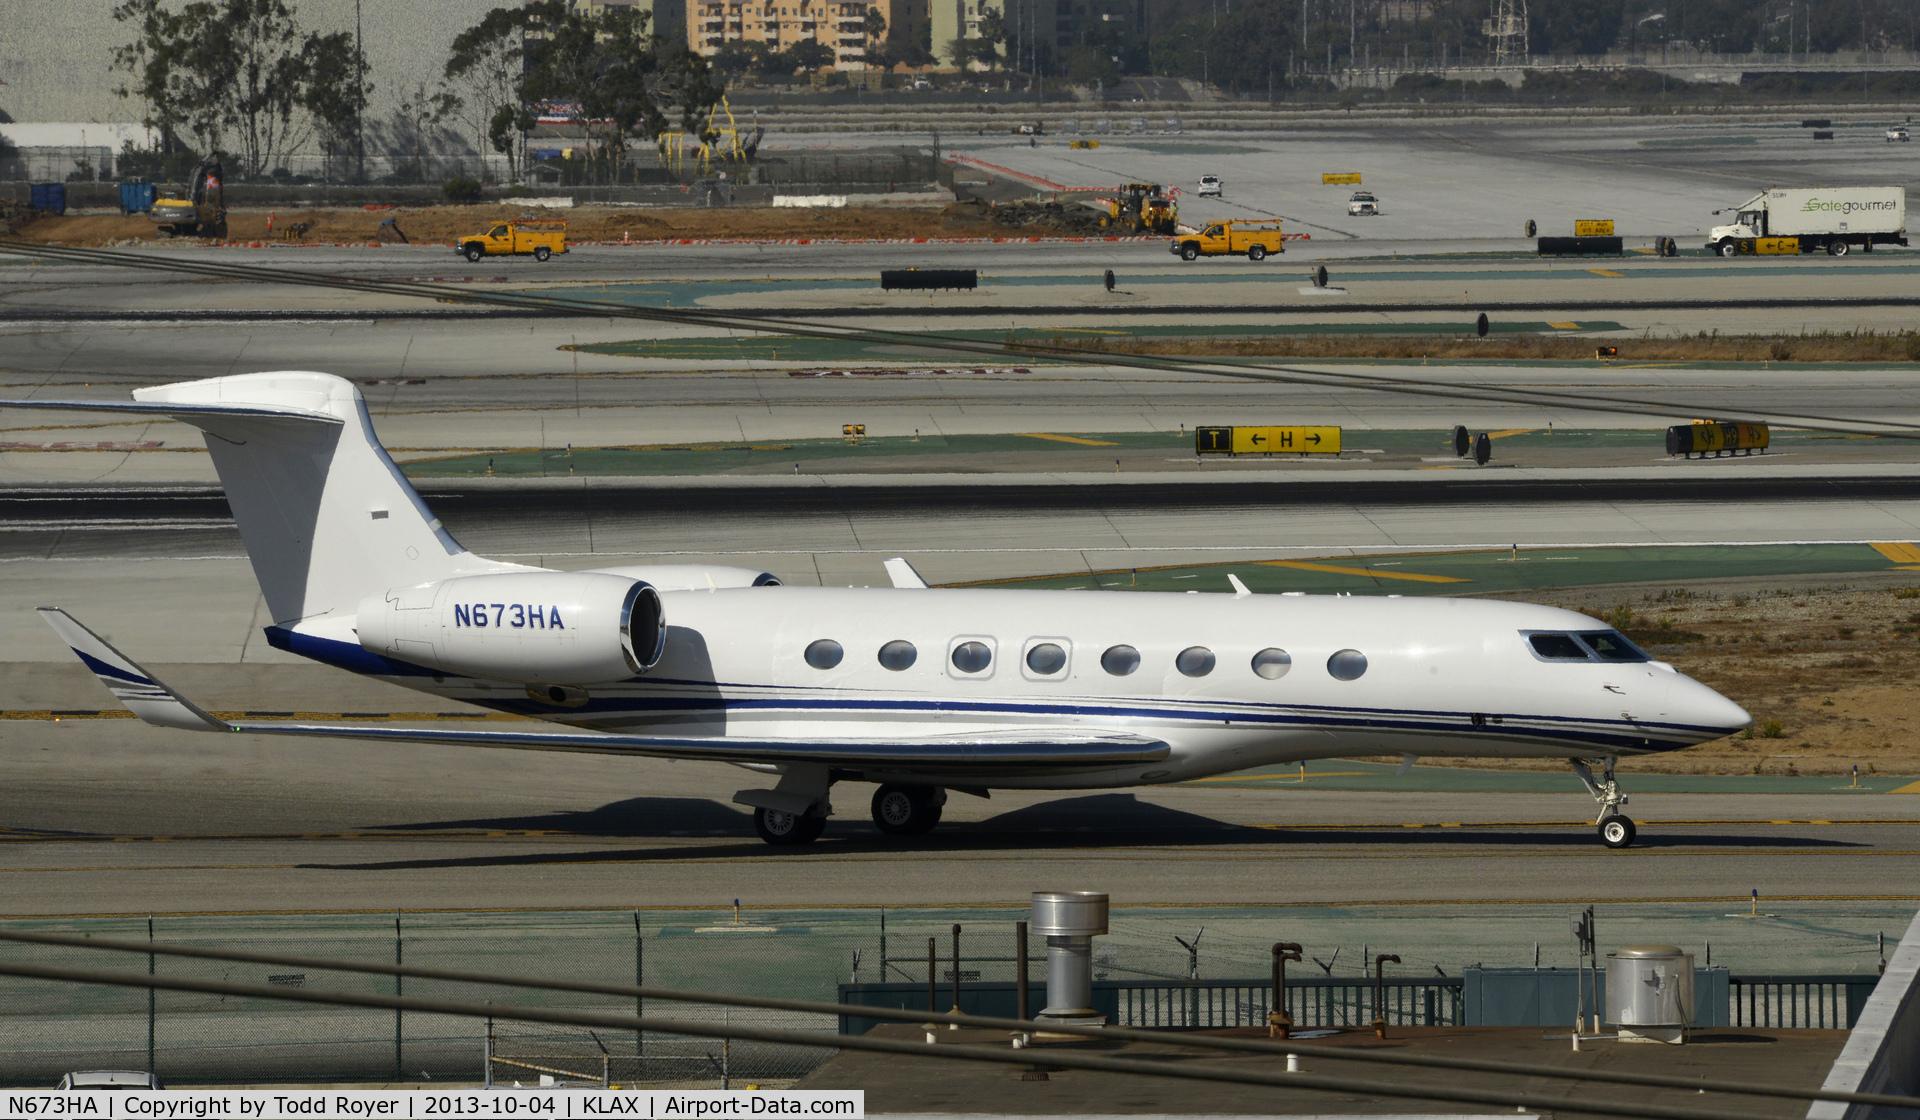 N673HA, 2013 Gulfstream Aerospace G650 (G-VI) C/N 6018, Taxiing to parking at LAX